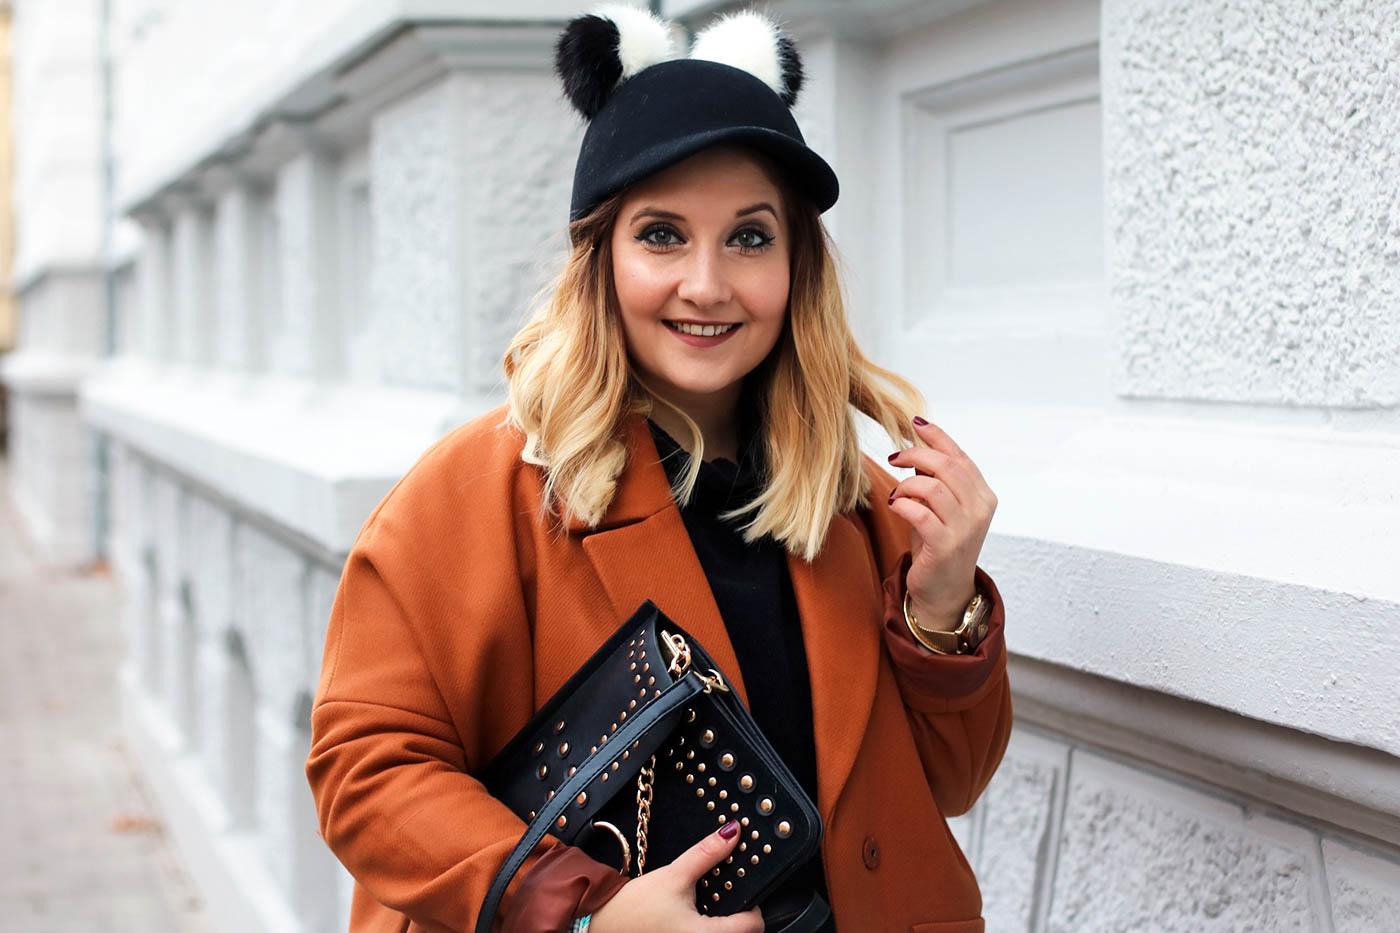 outfit-look-style-mantel-cappe-fashionblog-modeblog-gewinnspiel2